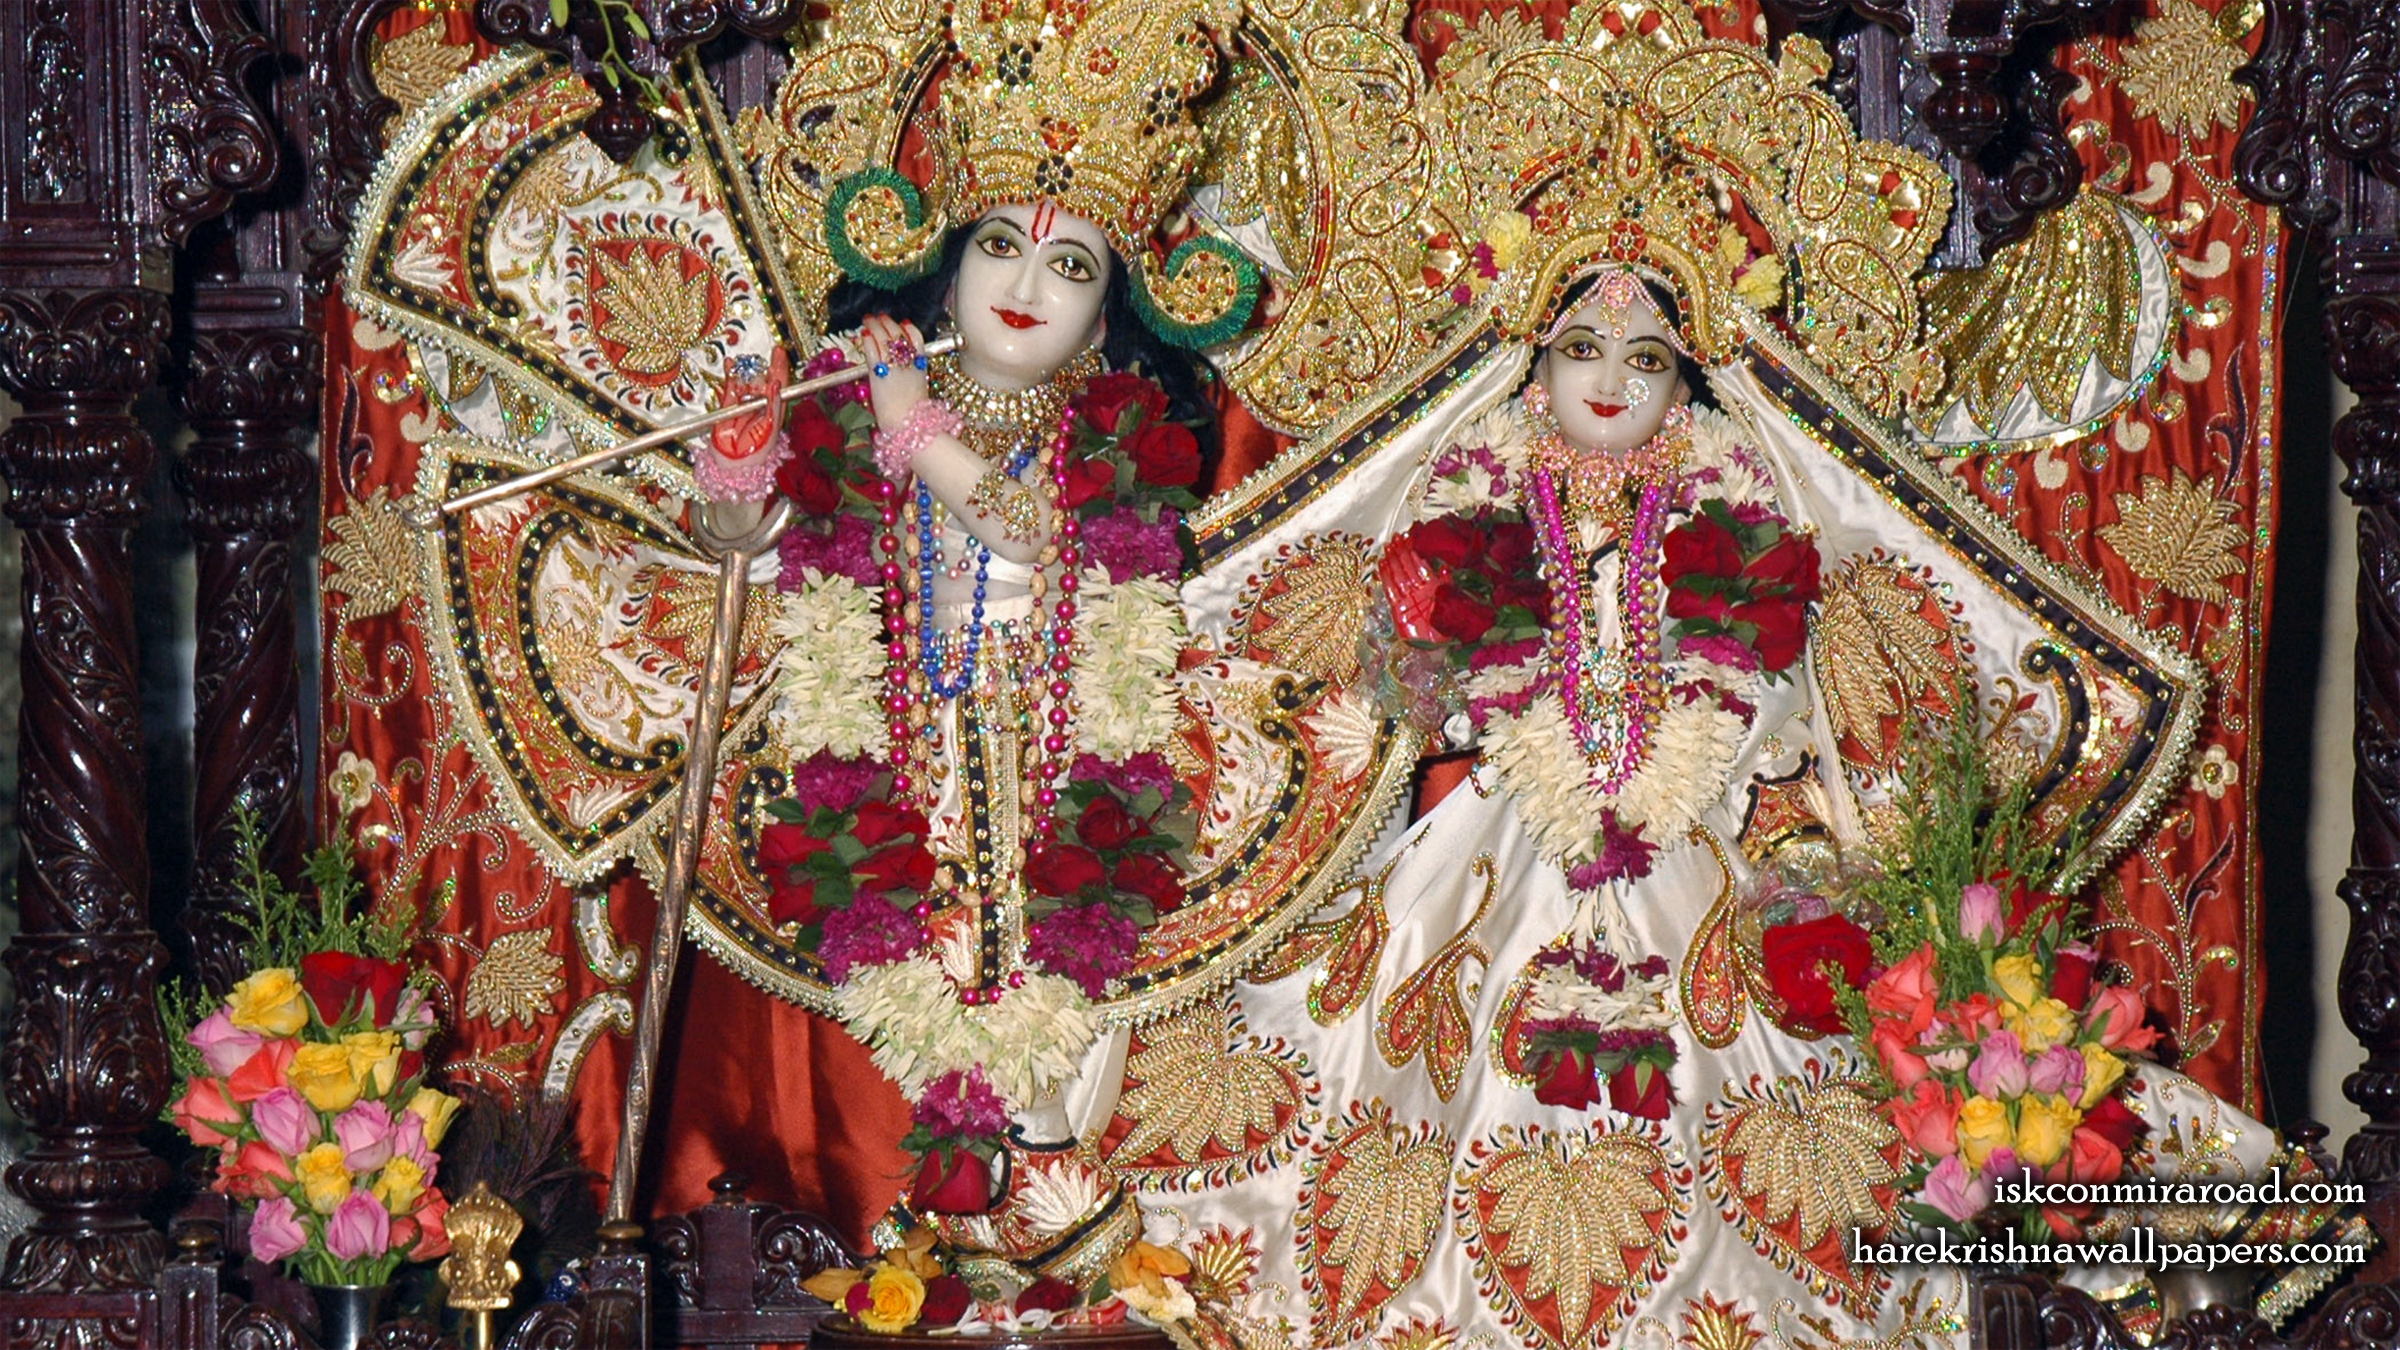 Sri Sri Radha Giridhari Wallpaper (015) Size 2400x1350 Download